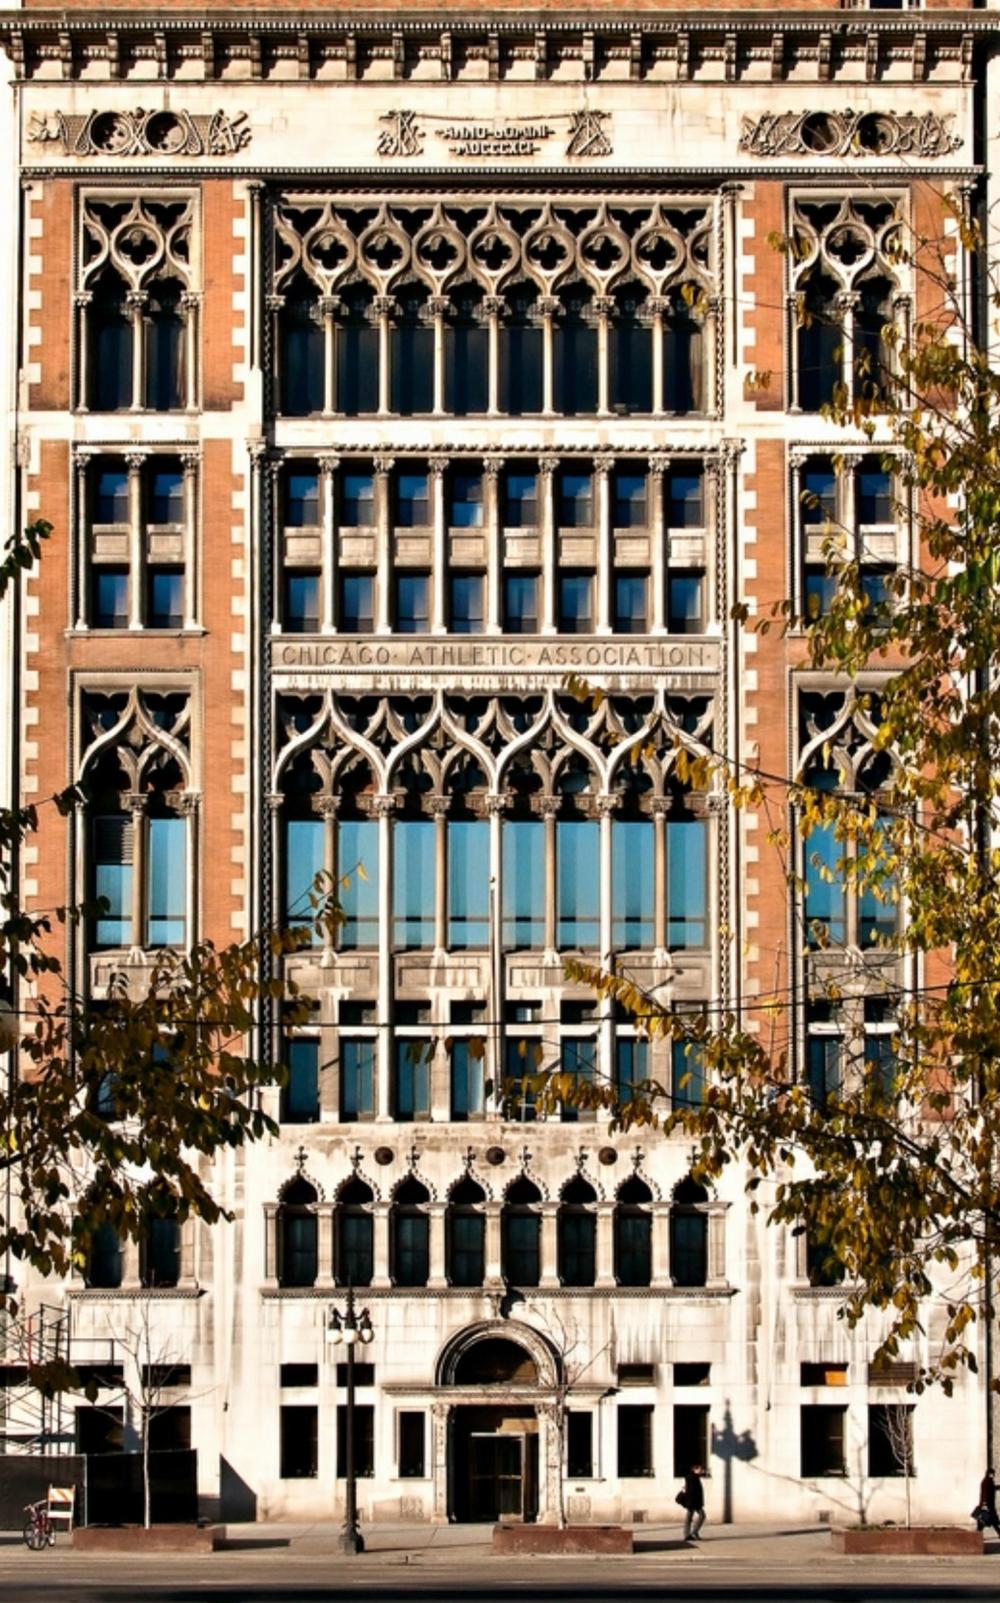 chicago-athletic-association-hotel-_-exterior.jpg